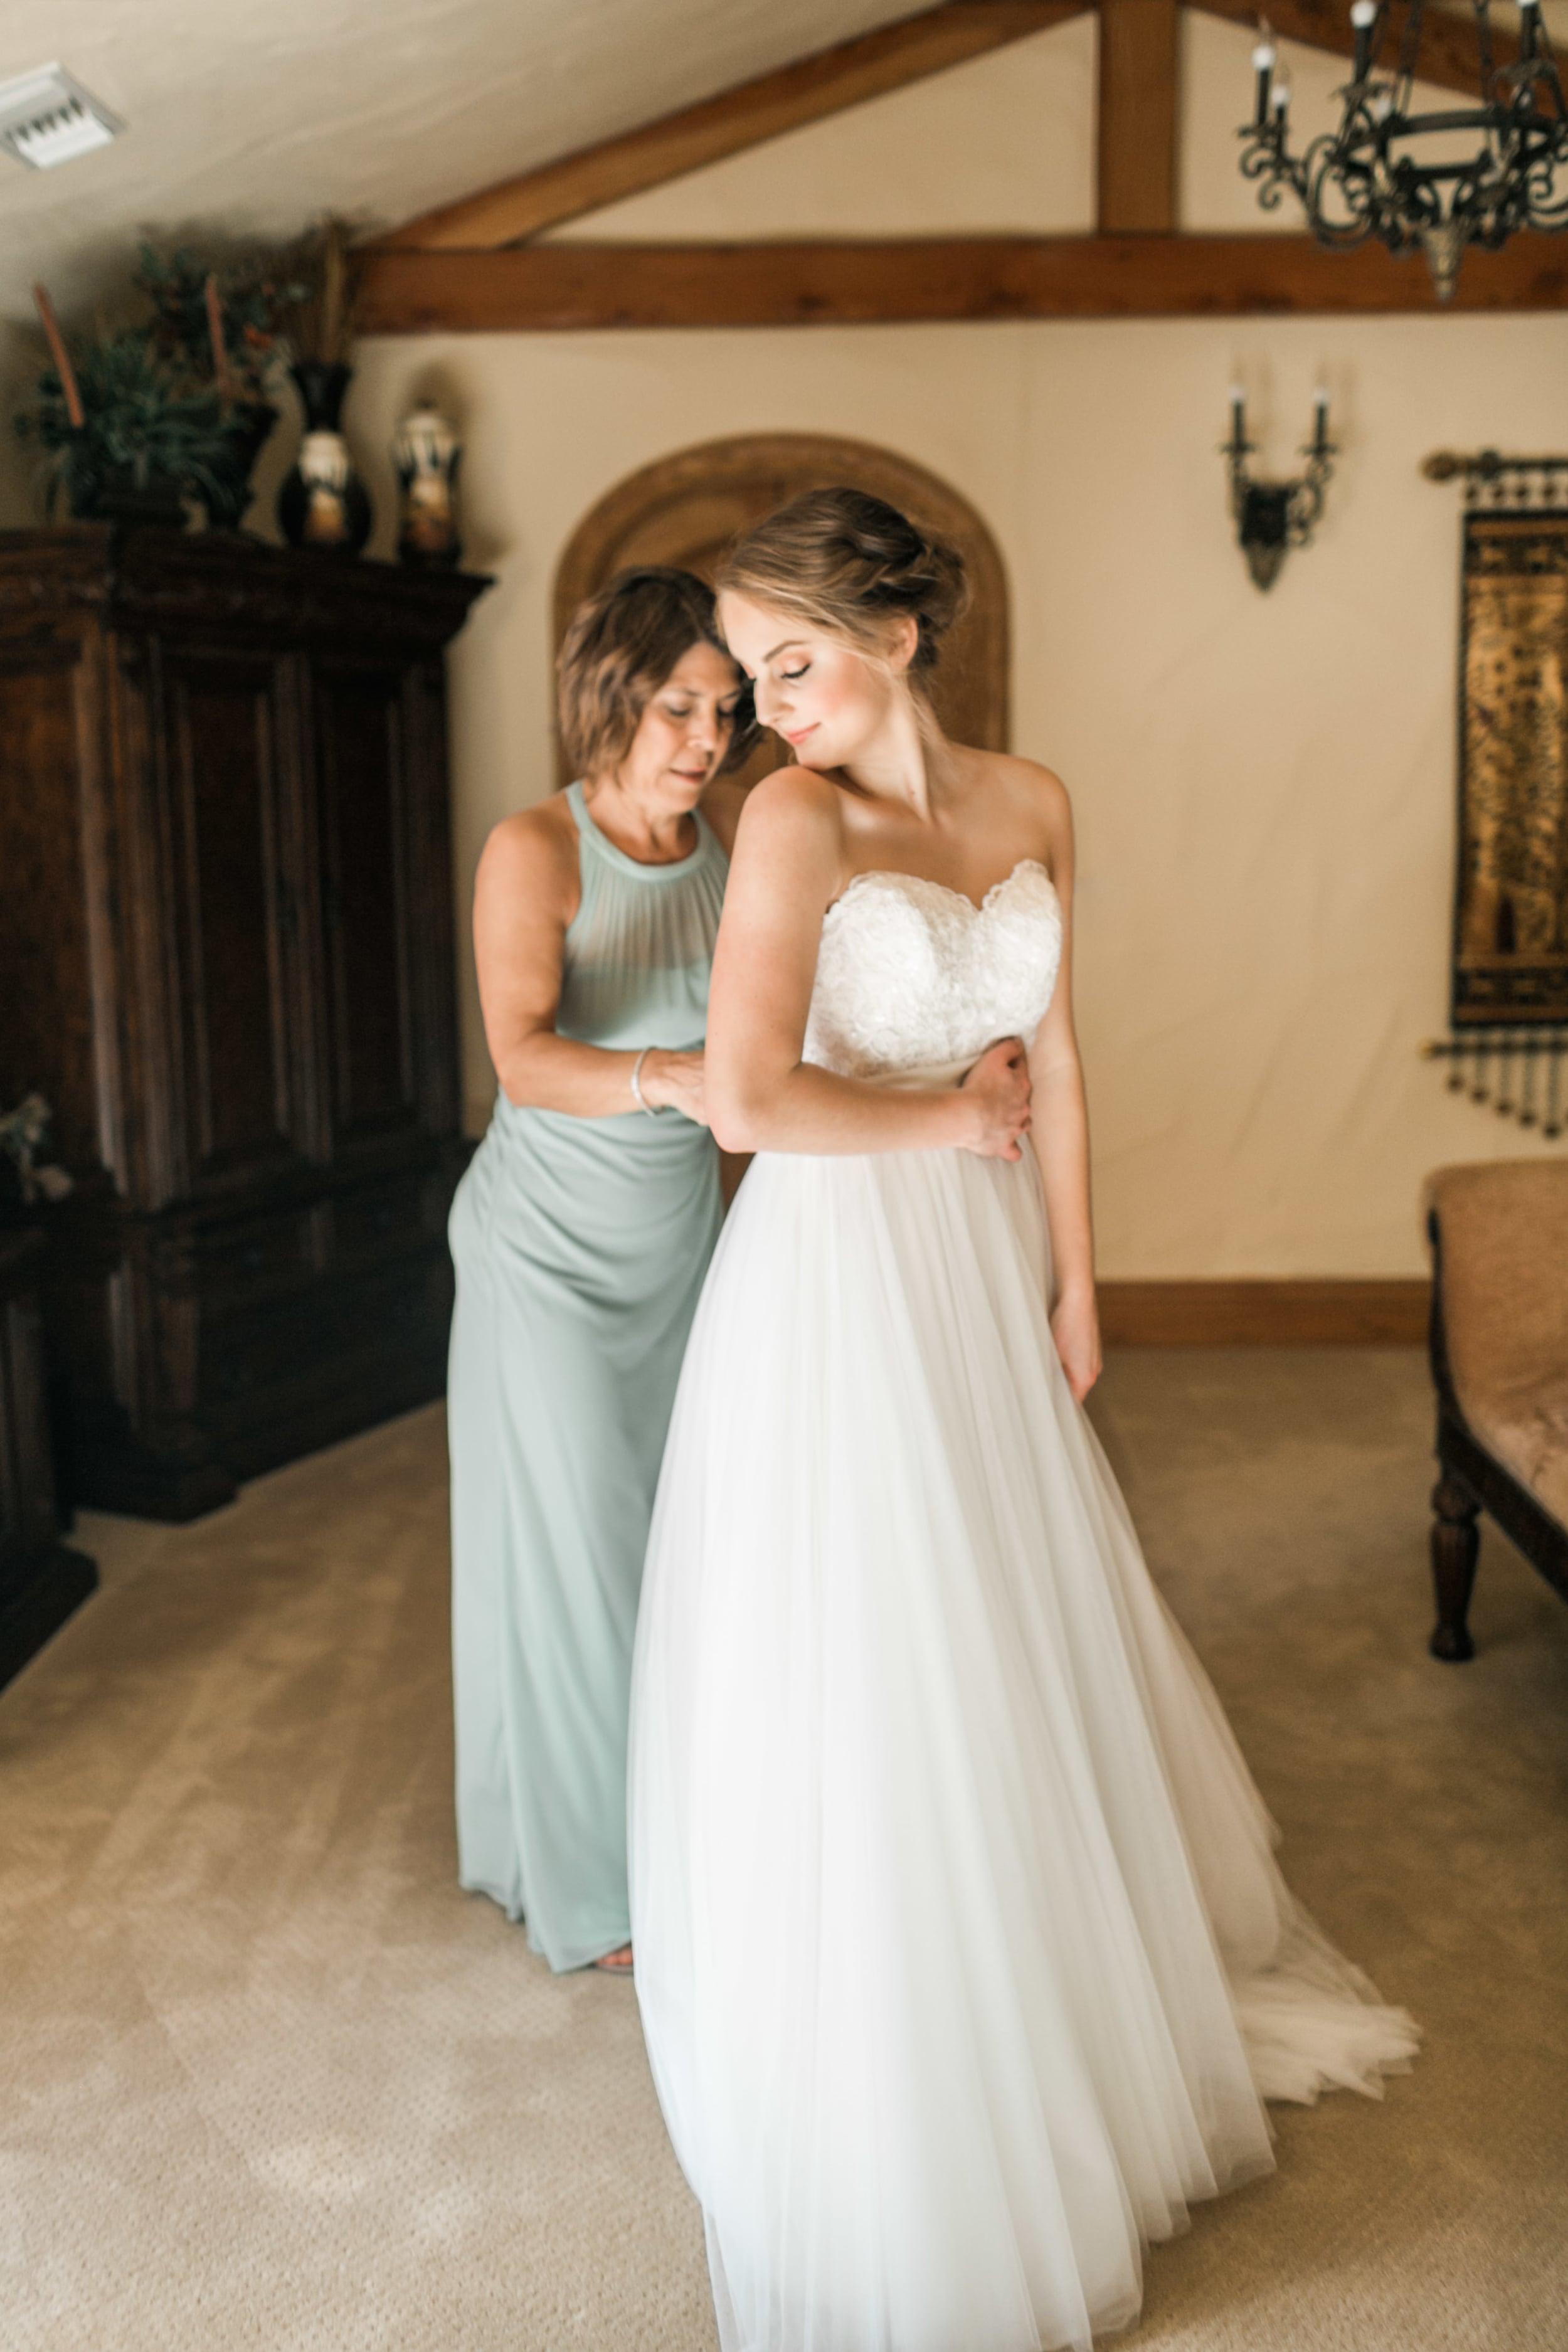 Natalie_Schutt_Photography_Winter_Wedding_San_Luis_Obispo-29.jpg